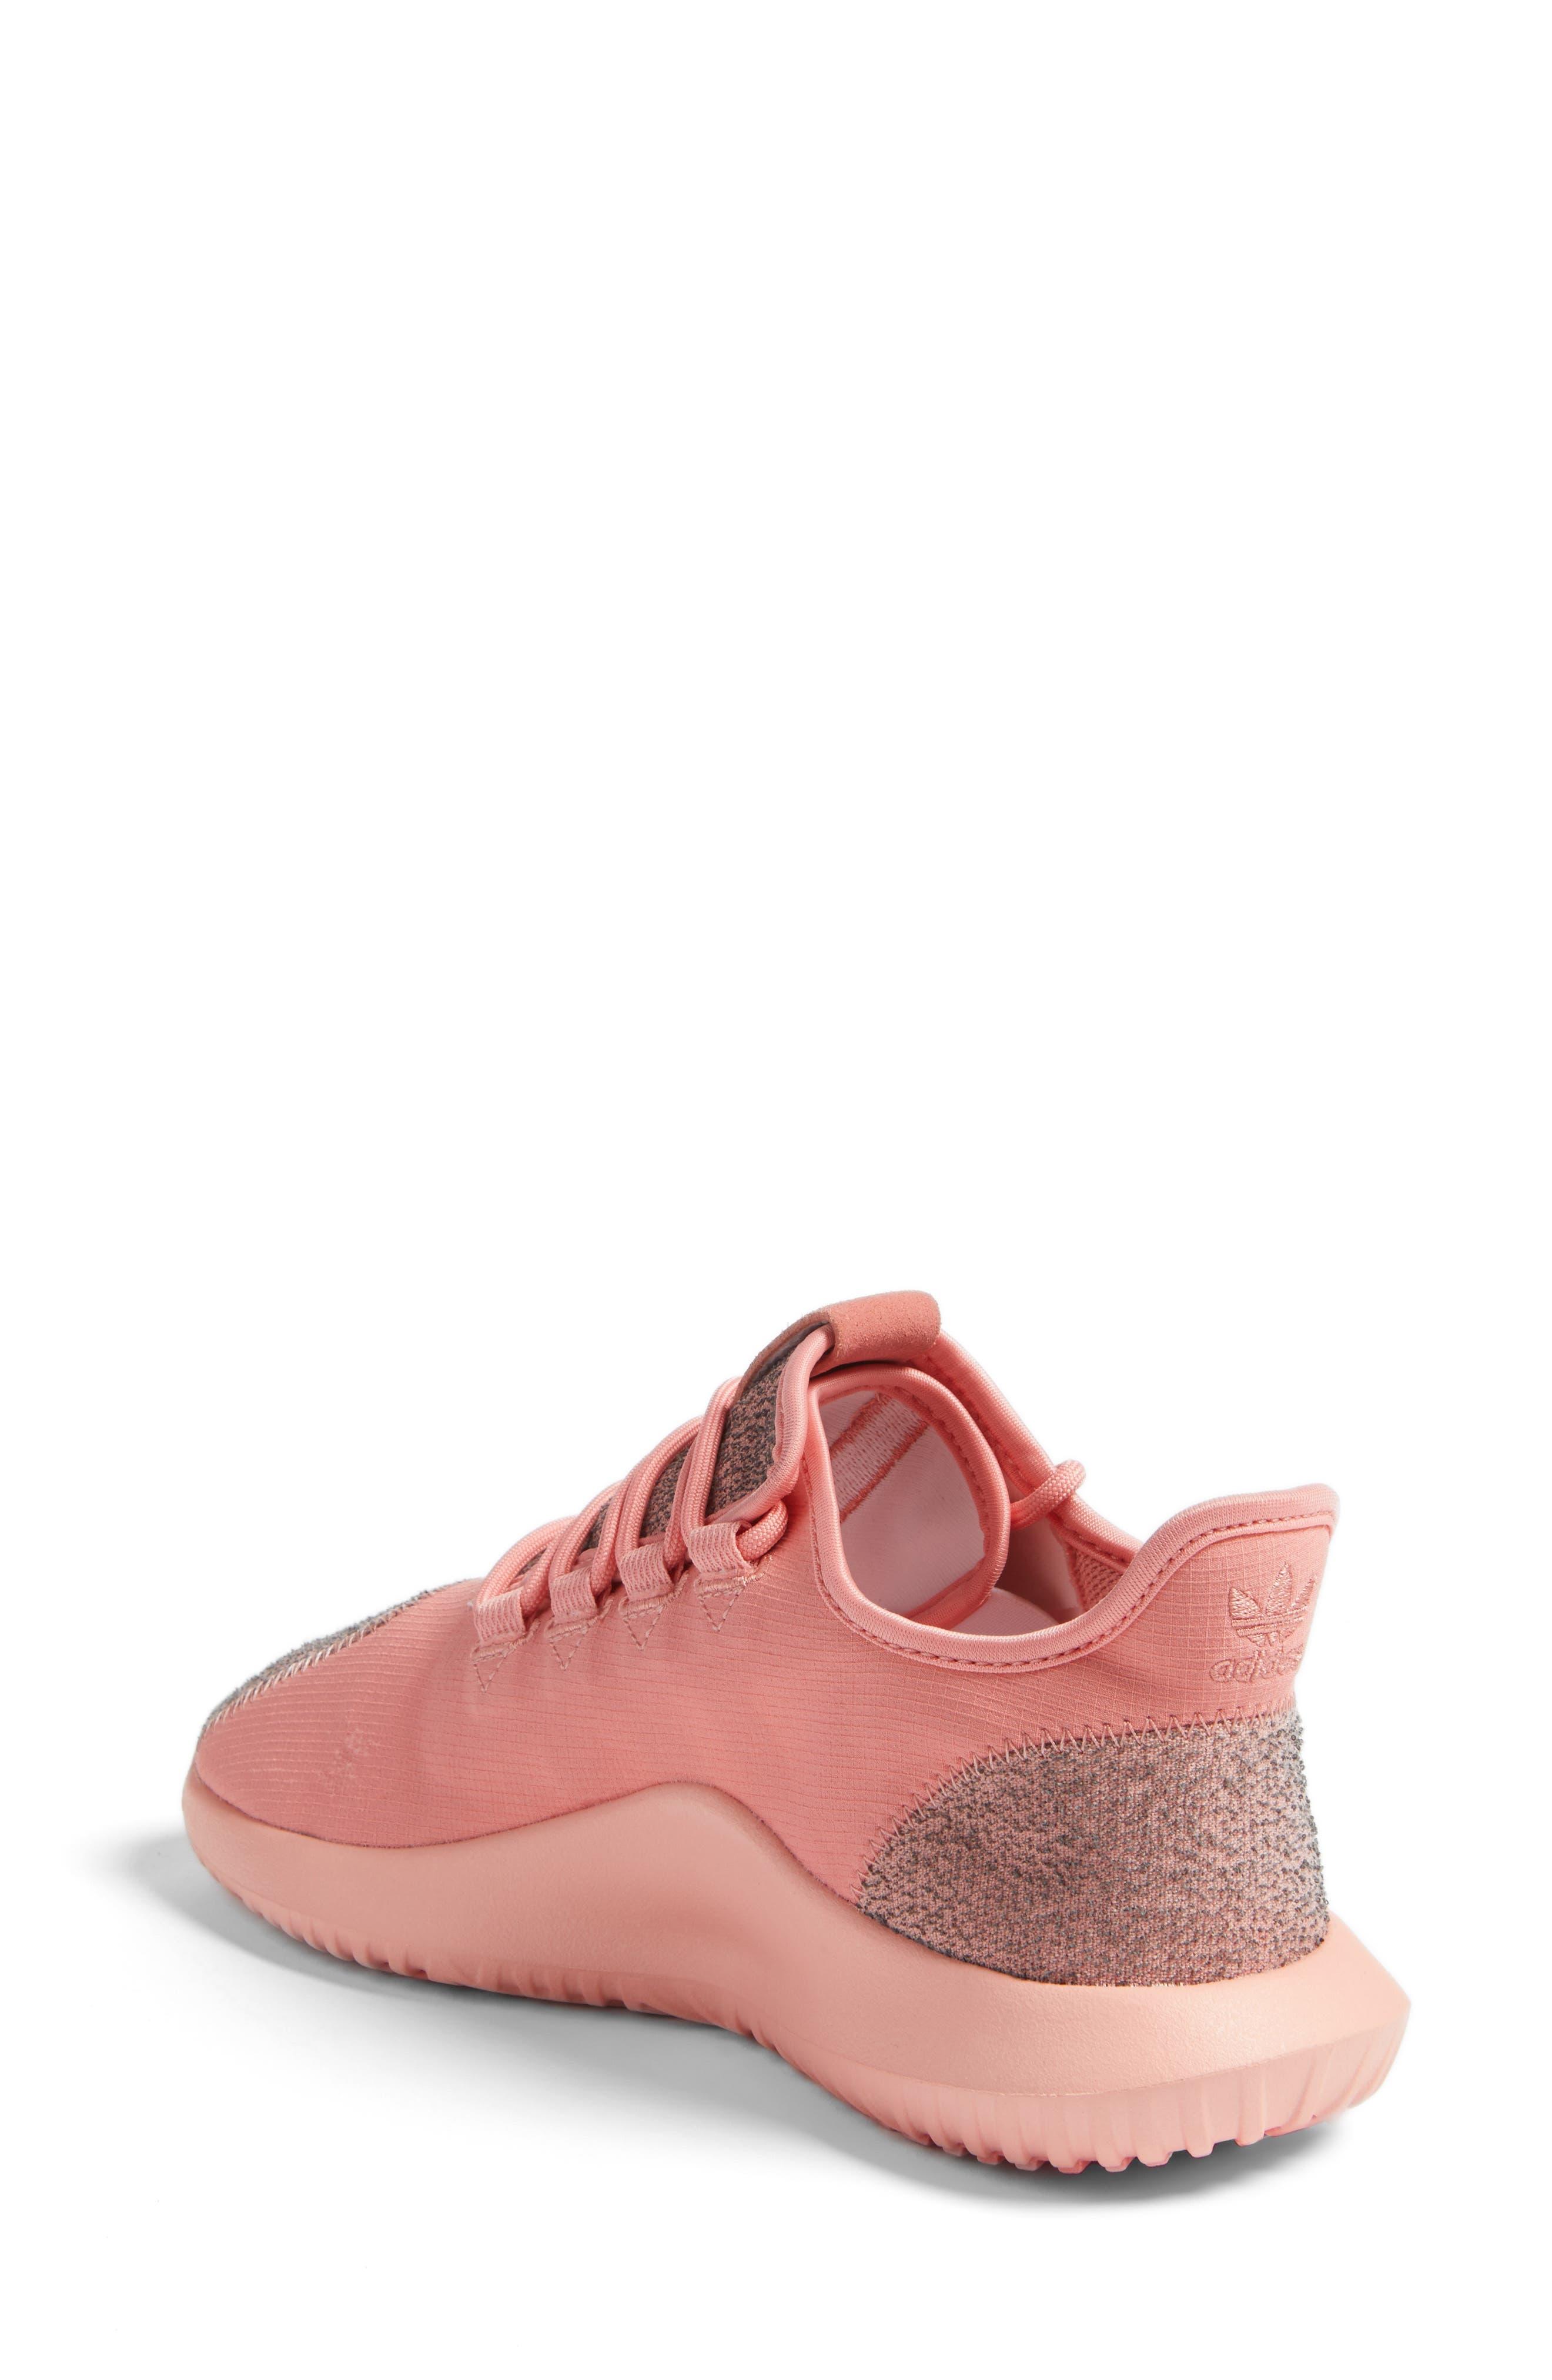 Tubular Shadow Sneaker,                             Alternate thumbnail 2, color,                             Raw Pink/ Raw Pink